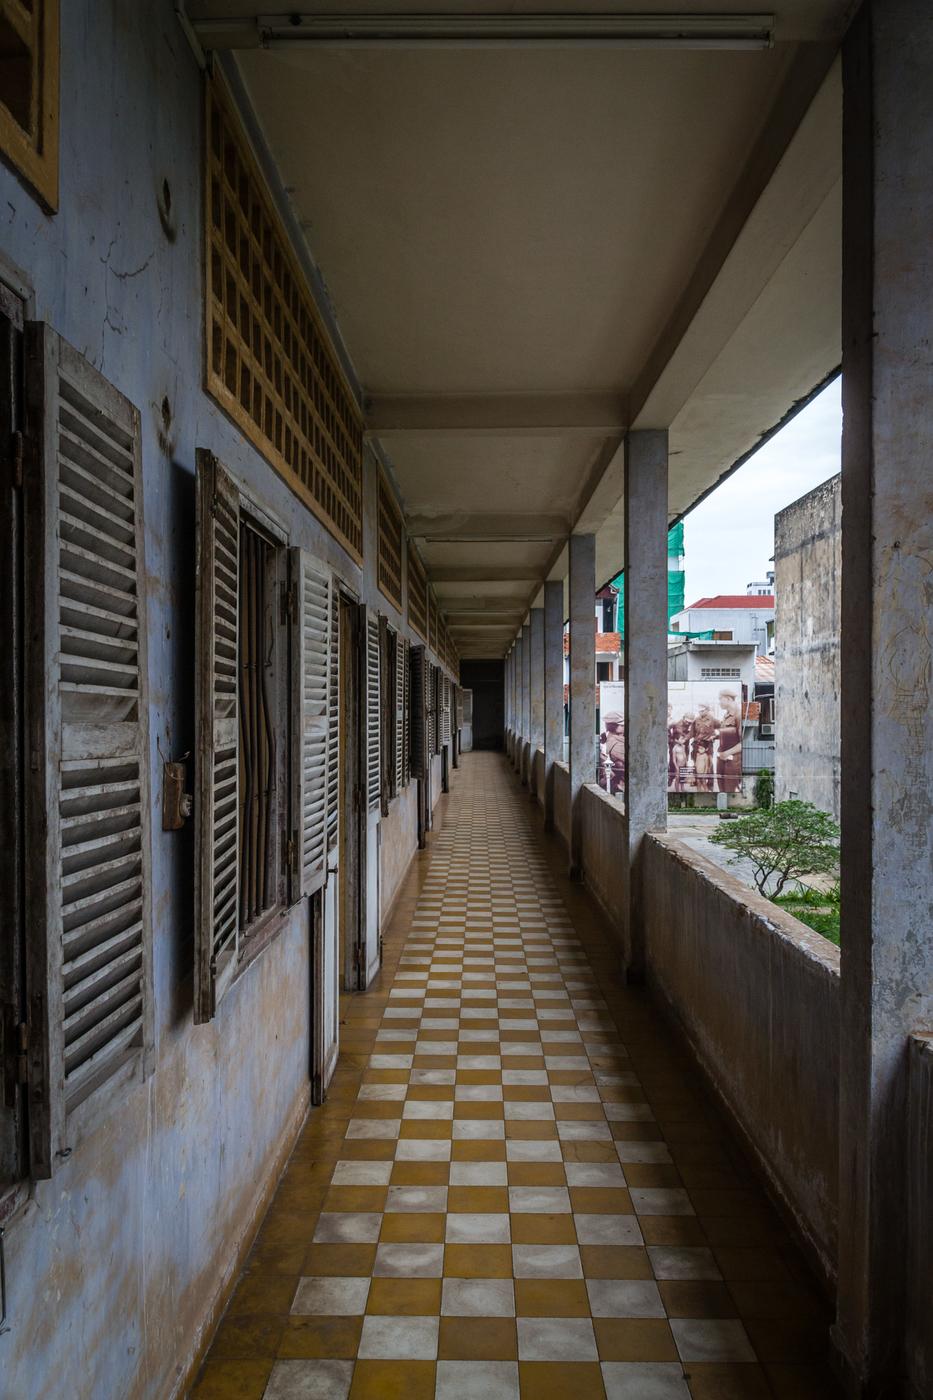 teul-sleng-hallway.jpg